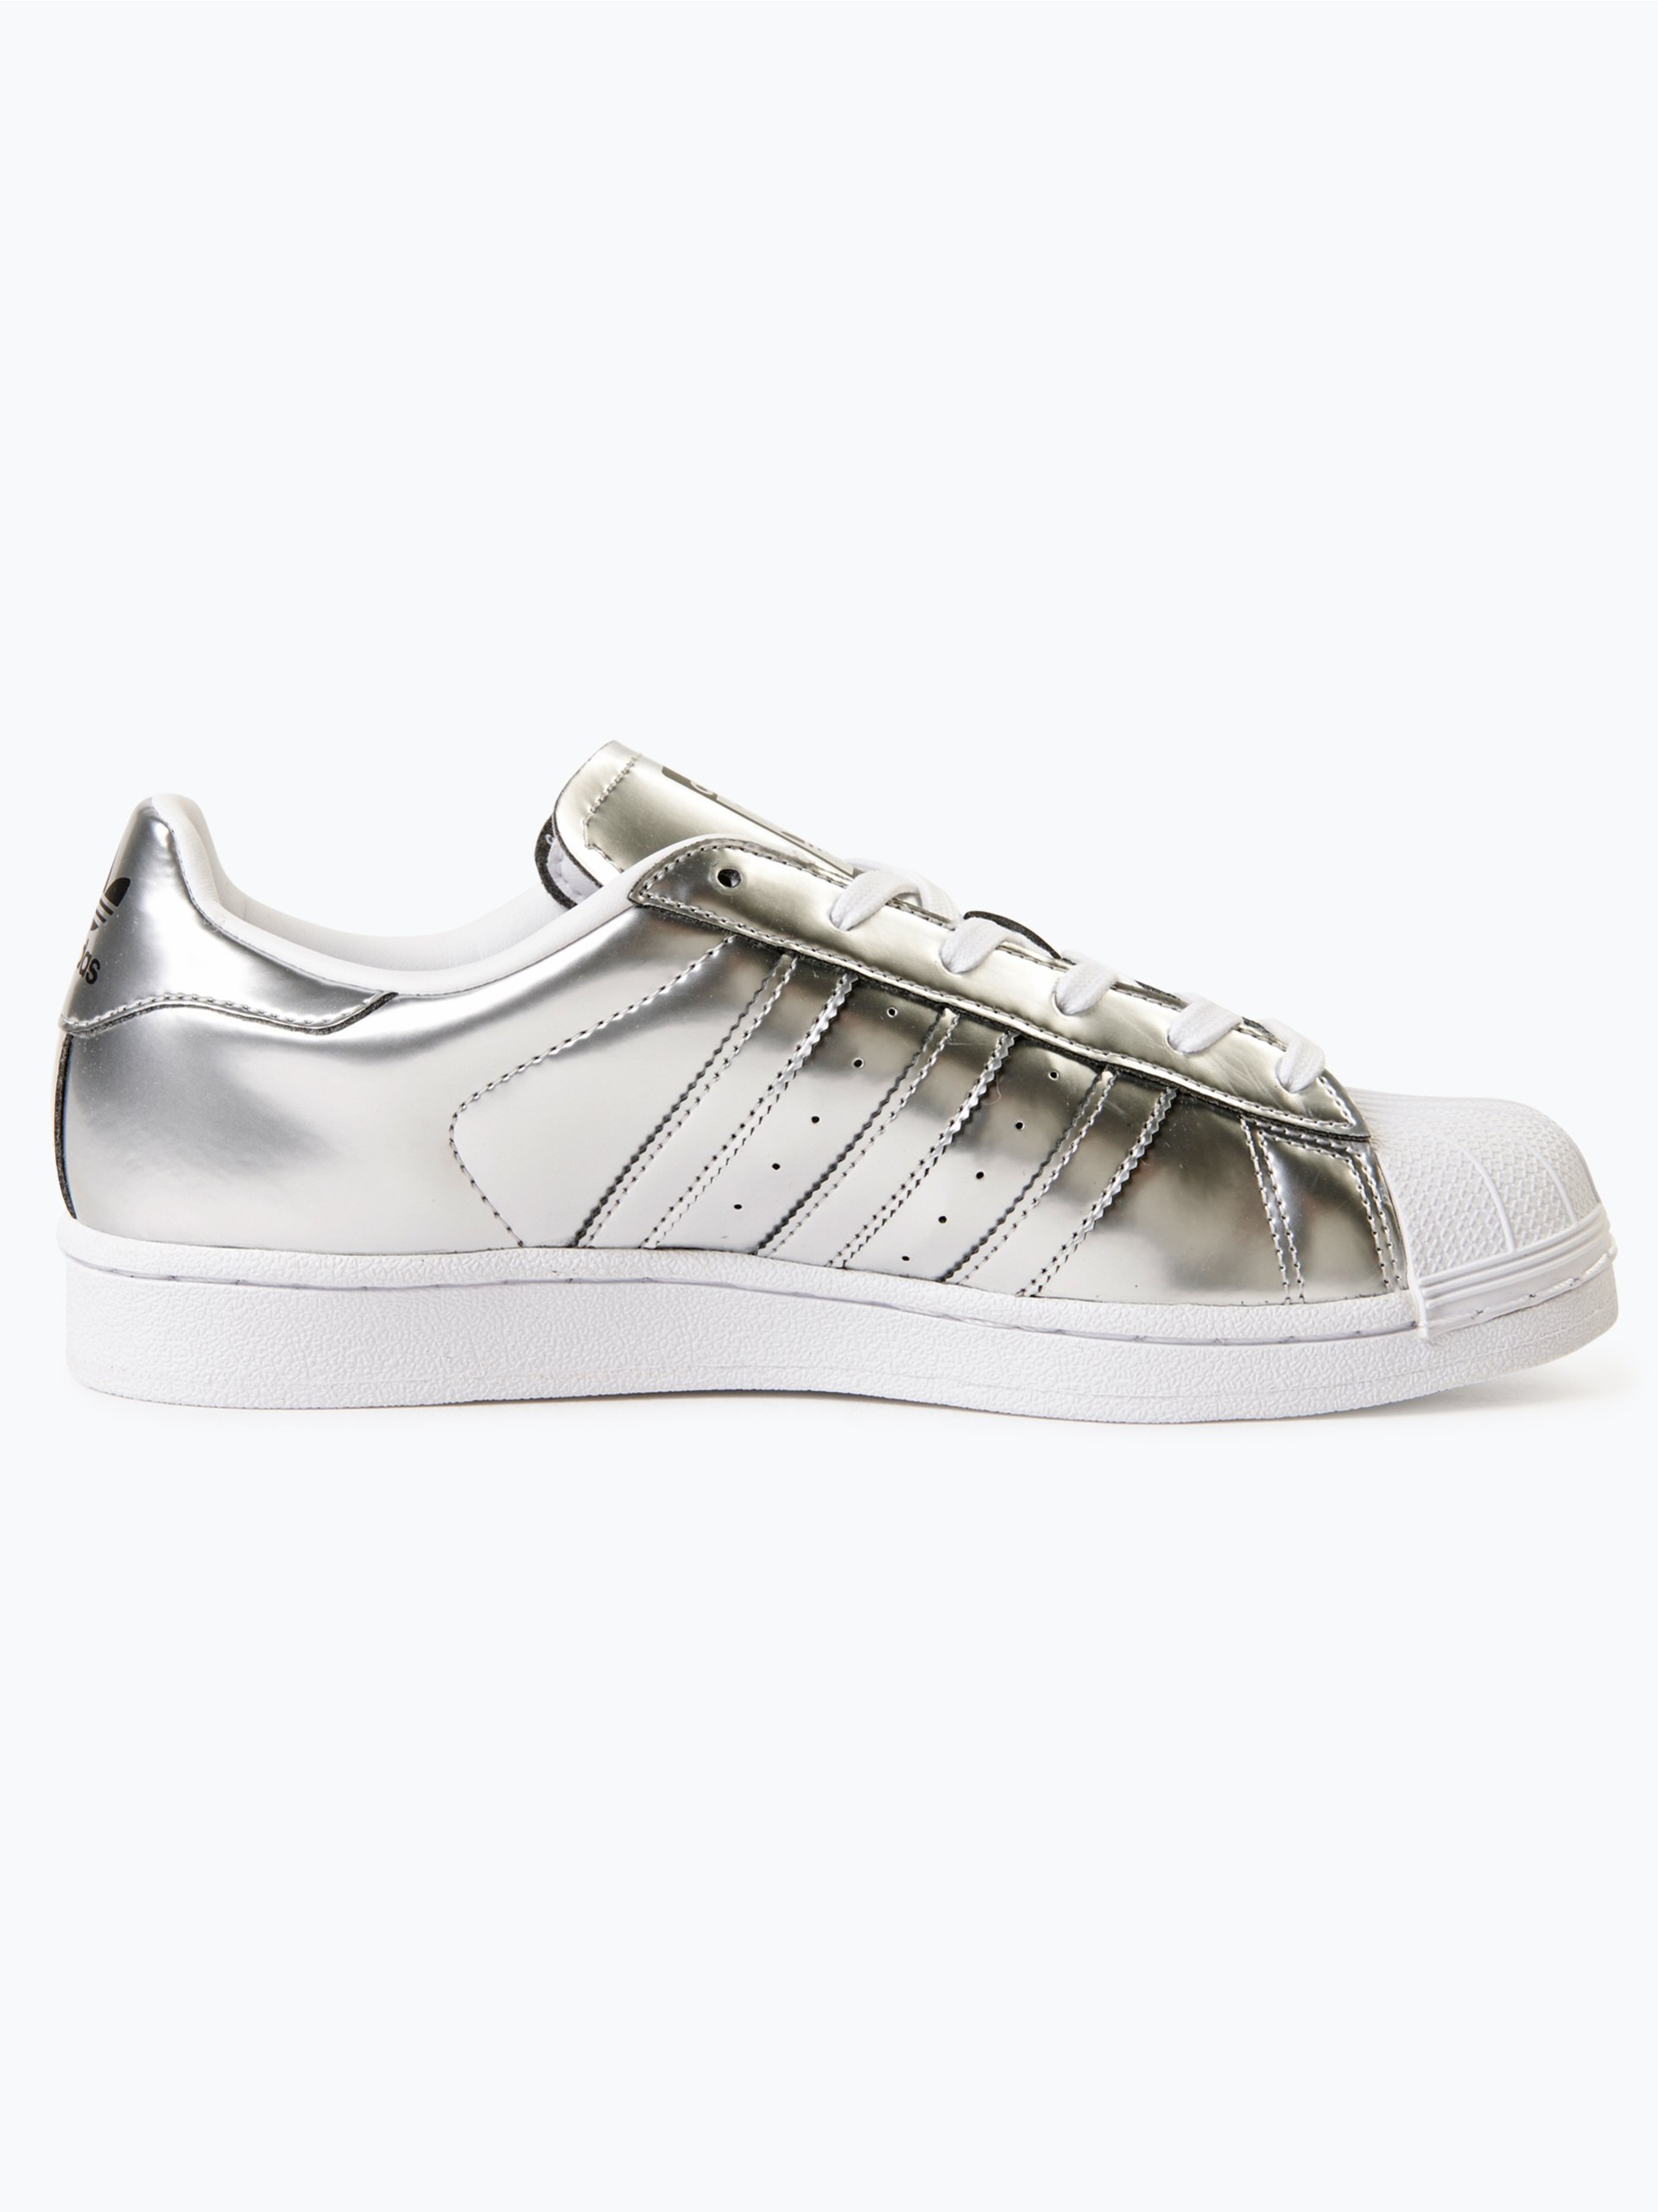 adidas originals damen sneaker superstar w silber uni. Black Bedroom Furniture Sets. Home Design Ideas